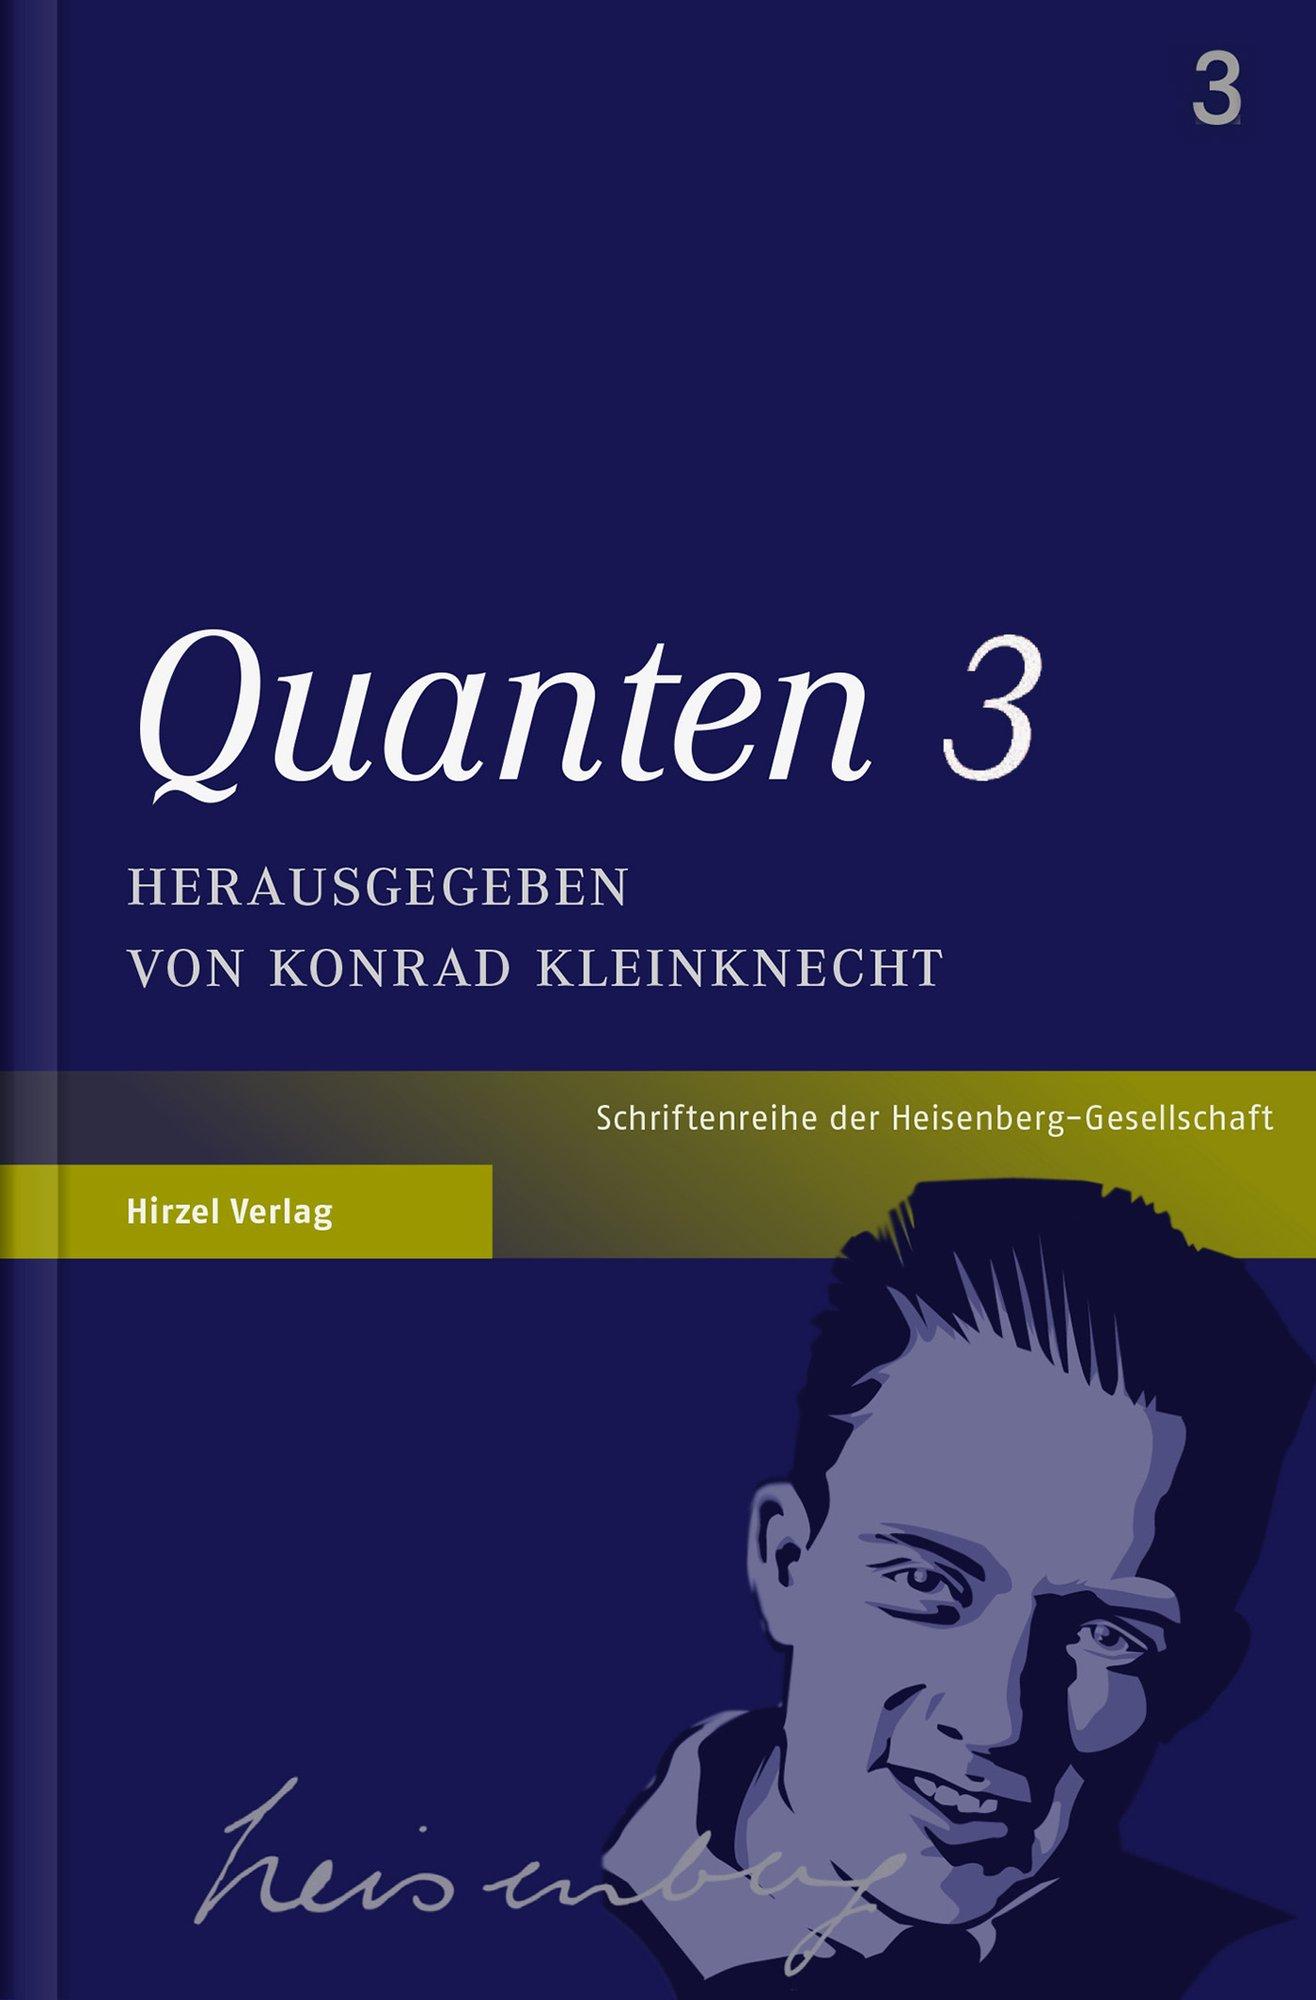 Quanten 3, Konrad Kleinknecht